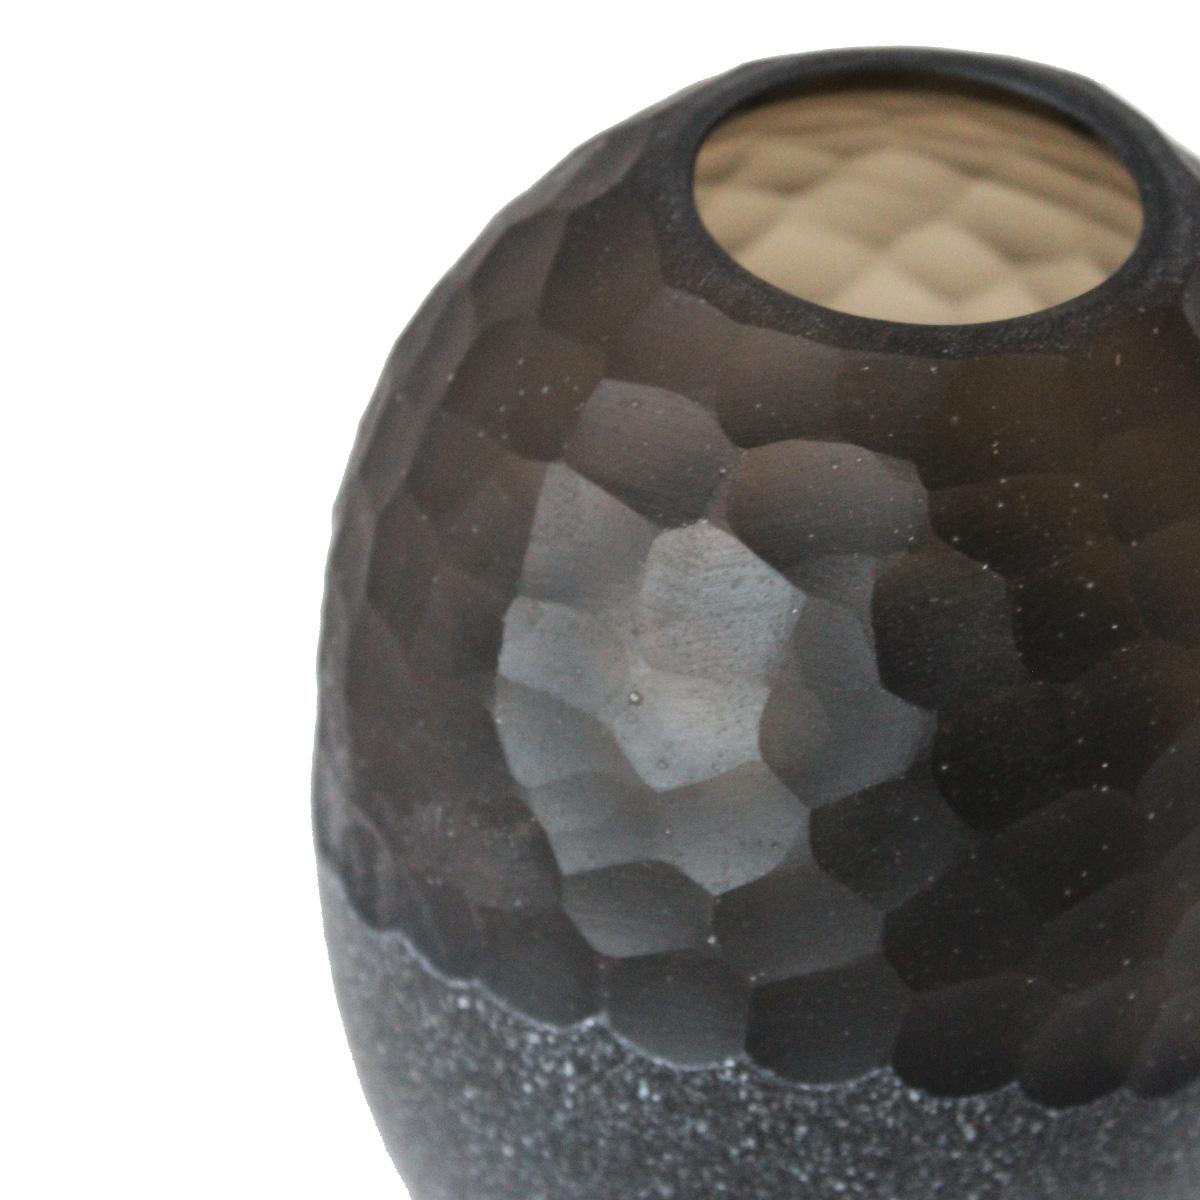 Vaza Lux staklo MUS-217